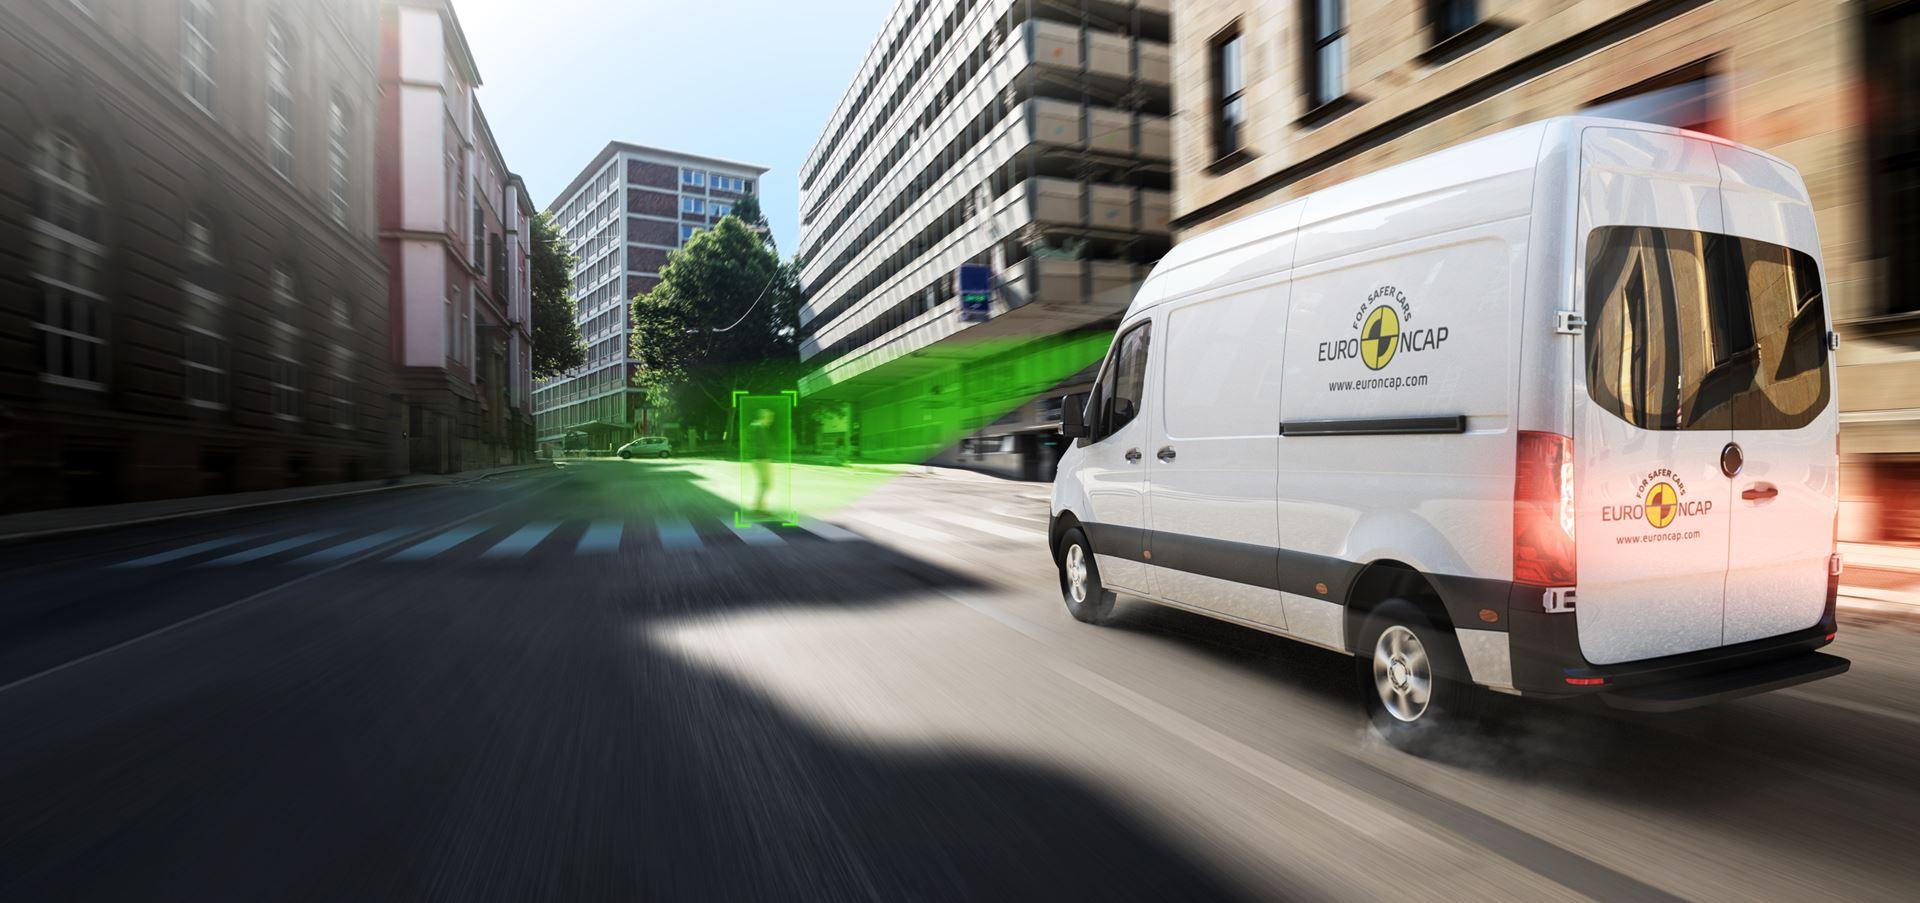 Euro NCAP Offers Yardstick for Commercial Van Safety